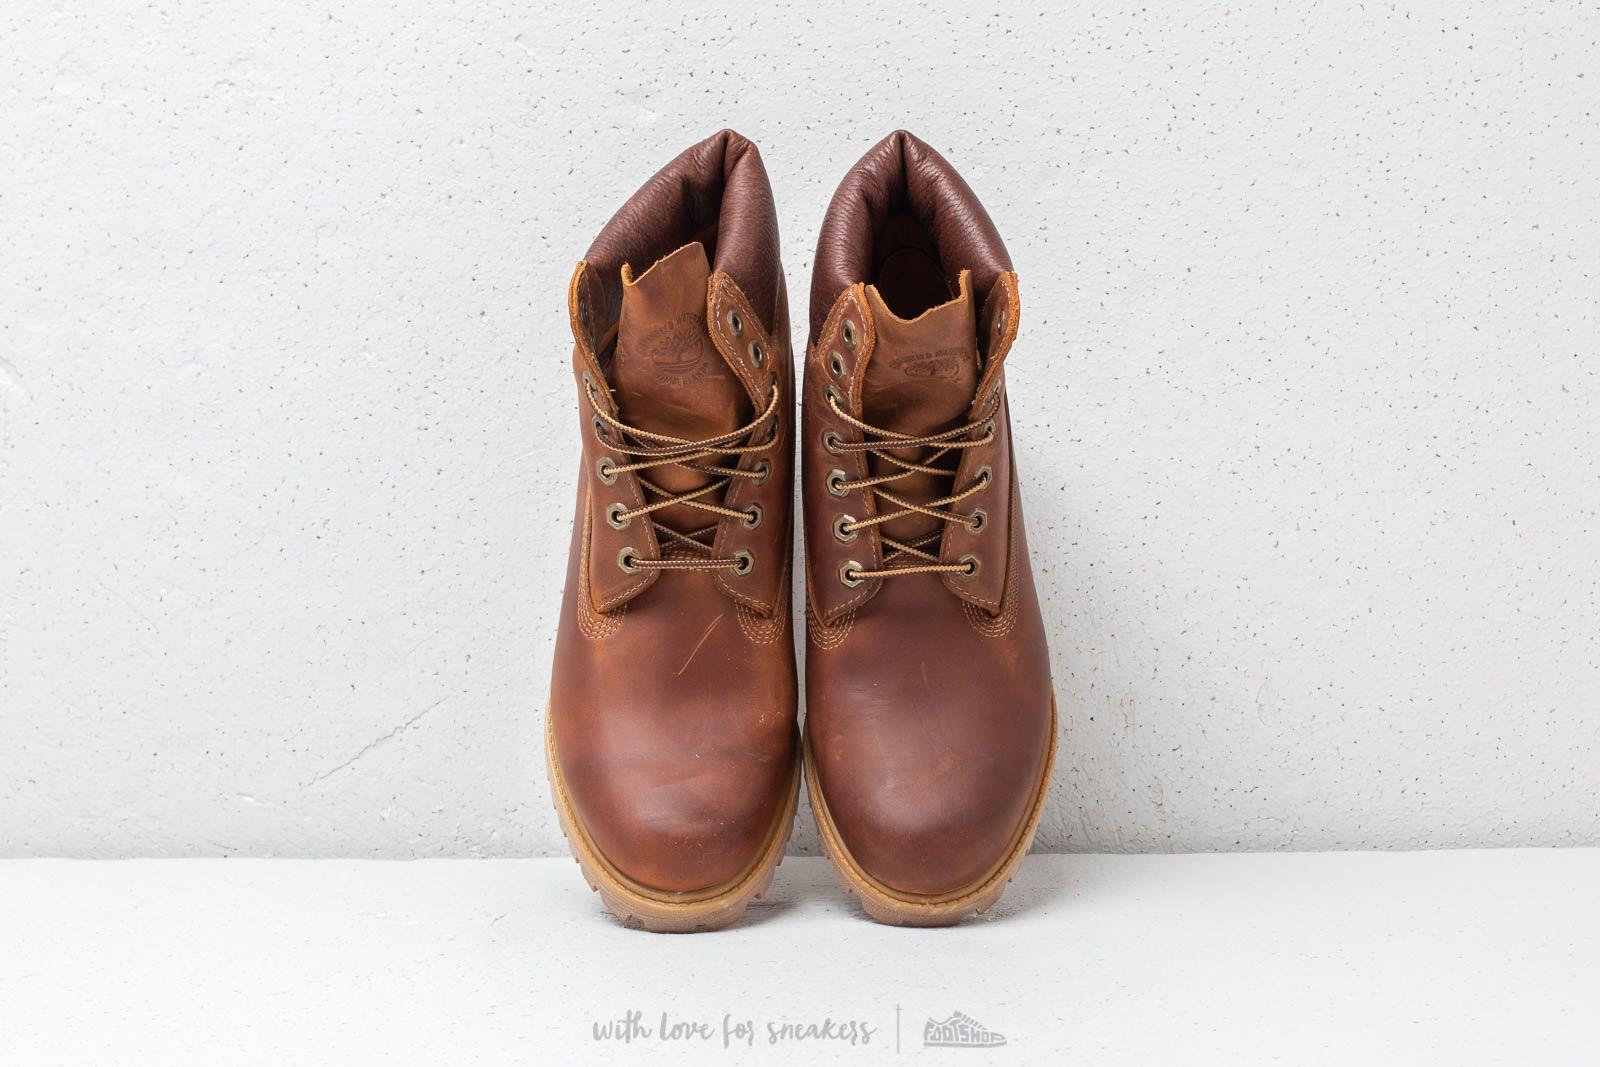 Annversary Footshop Original In 6 Af Brown Timberland Men's Hommes HwqfwTp